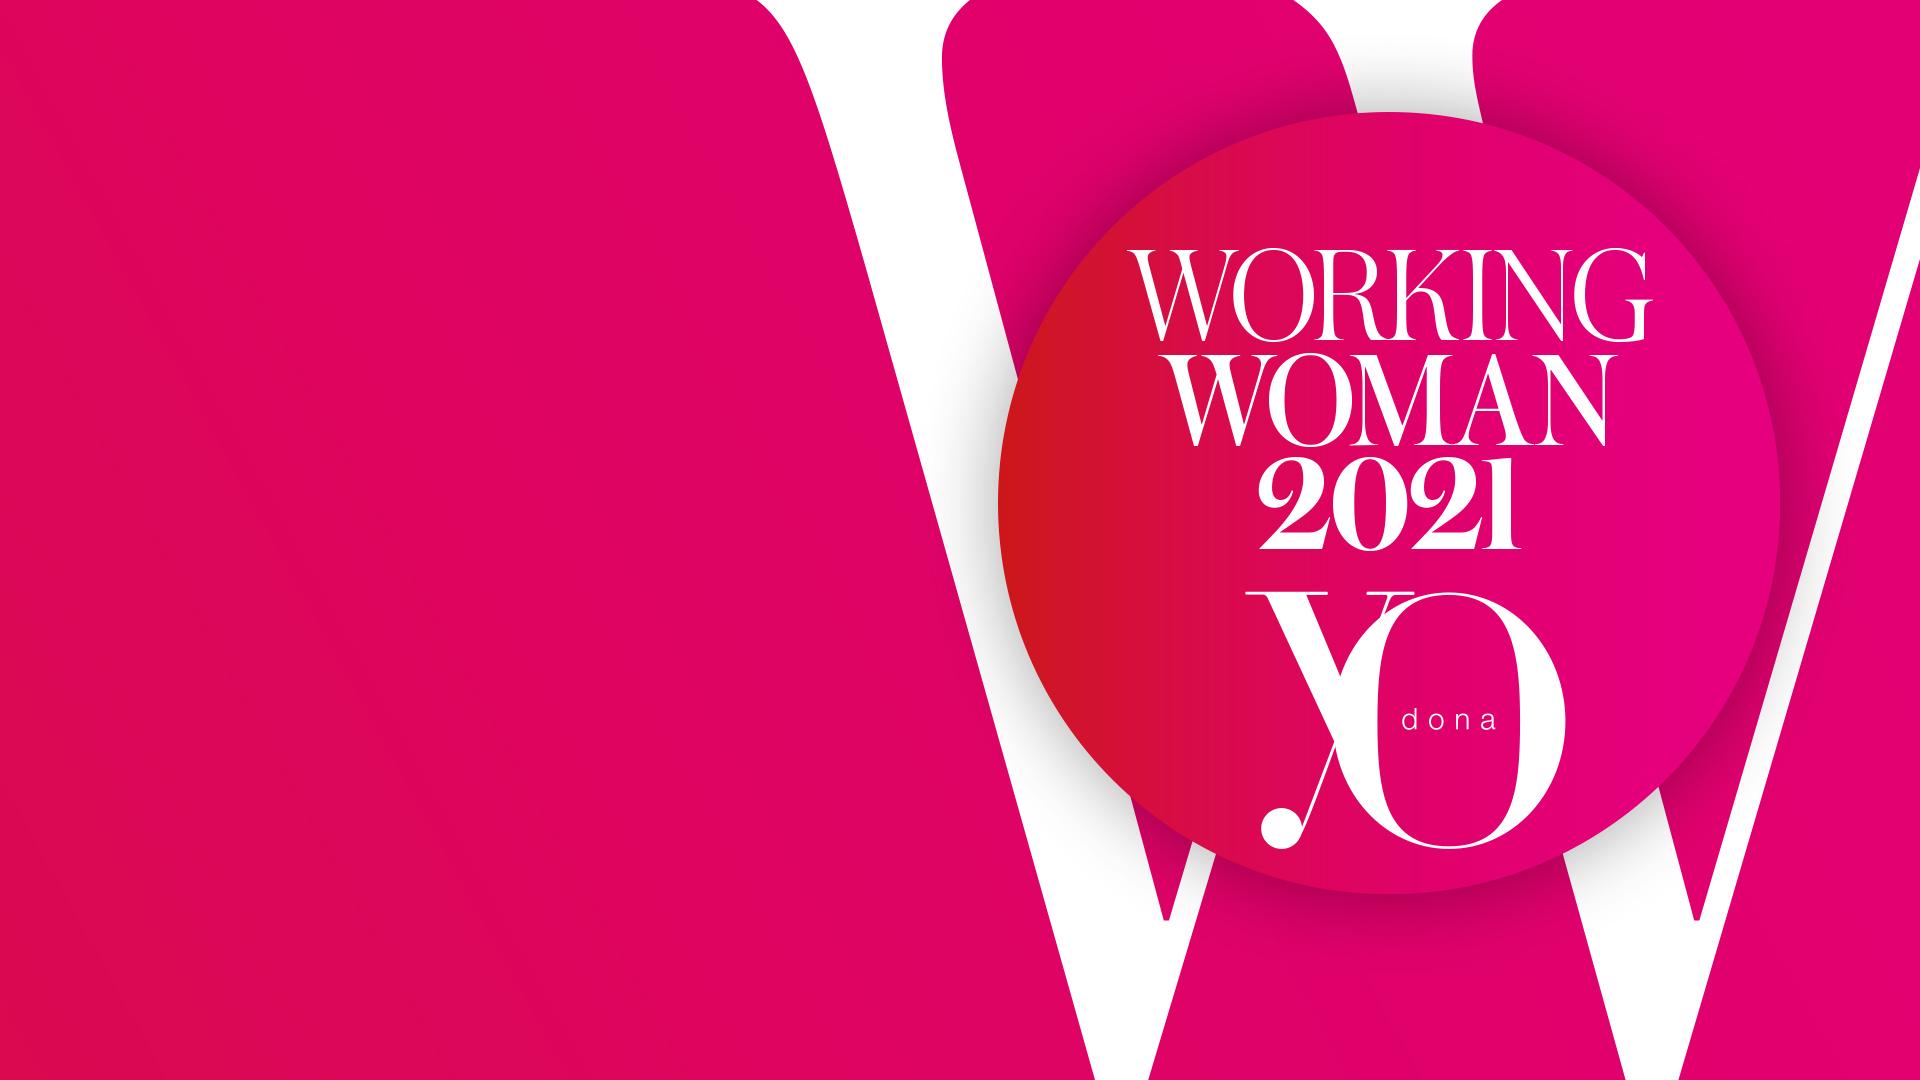 Working Woman 2021